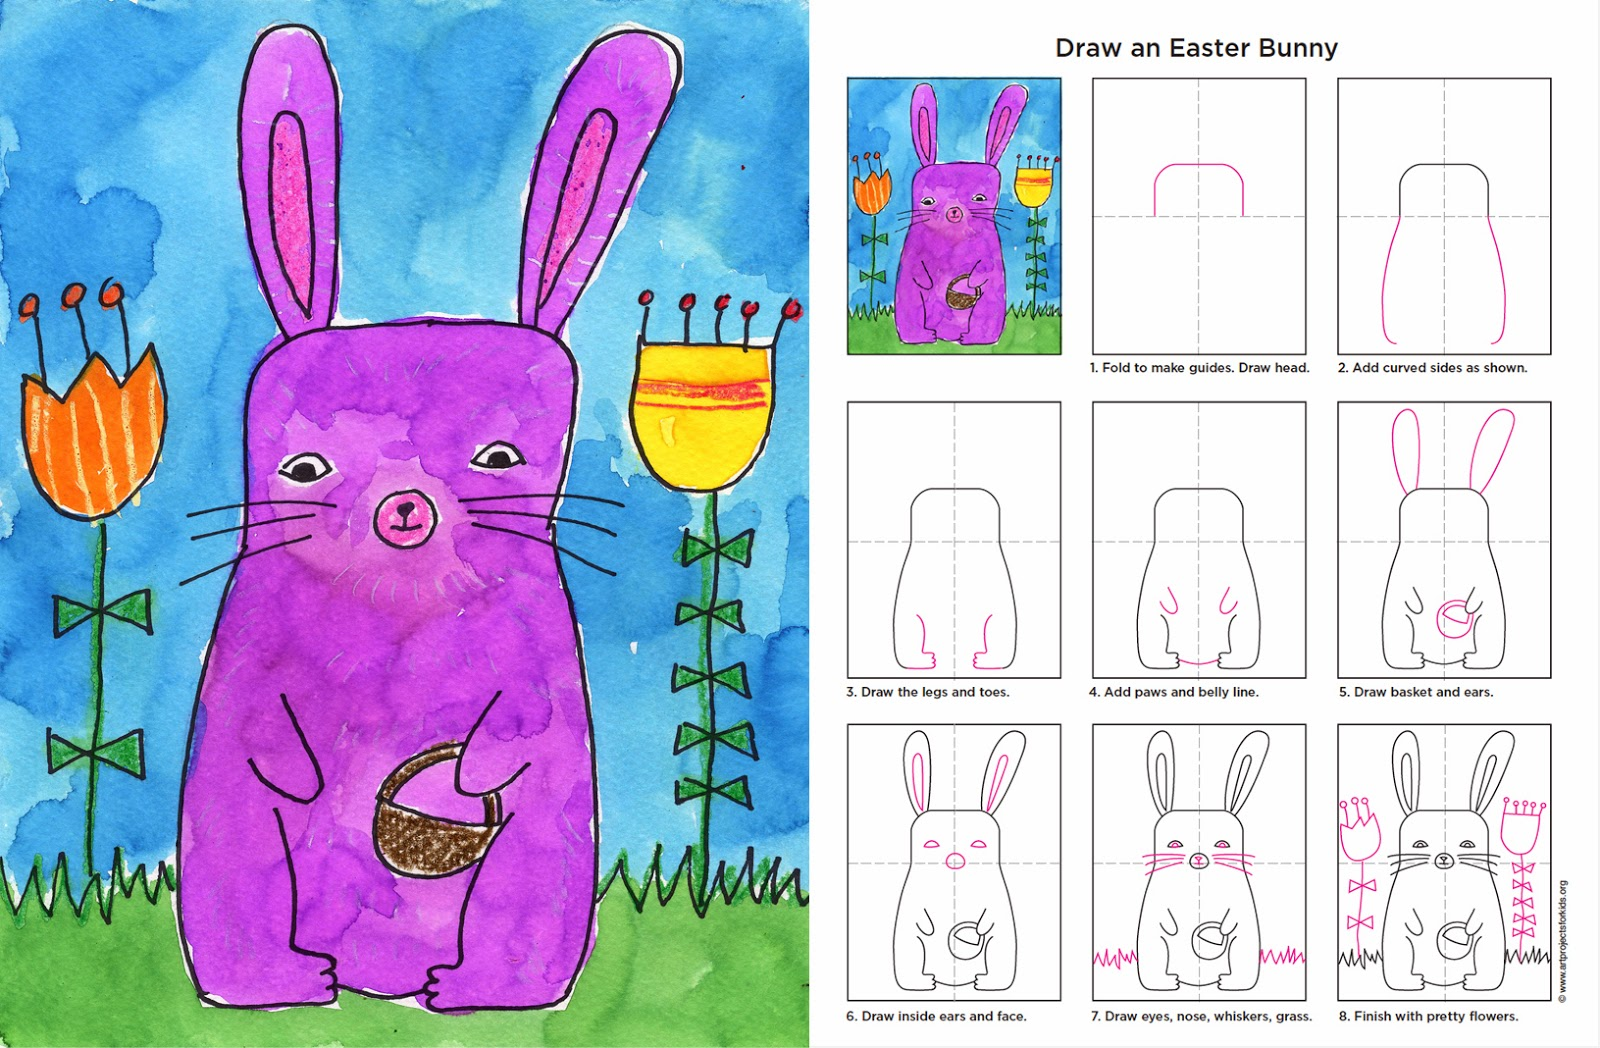 http://1.bp.blogspot.com/-MlLy8kbGjXw/UyFIX1McteI/AAAAAAAAS5s/w-B5uw1GD4Y/s1600/Easter+Bunny+Post.jpg